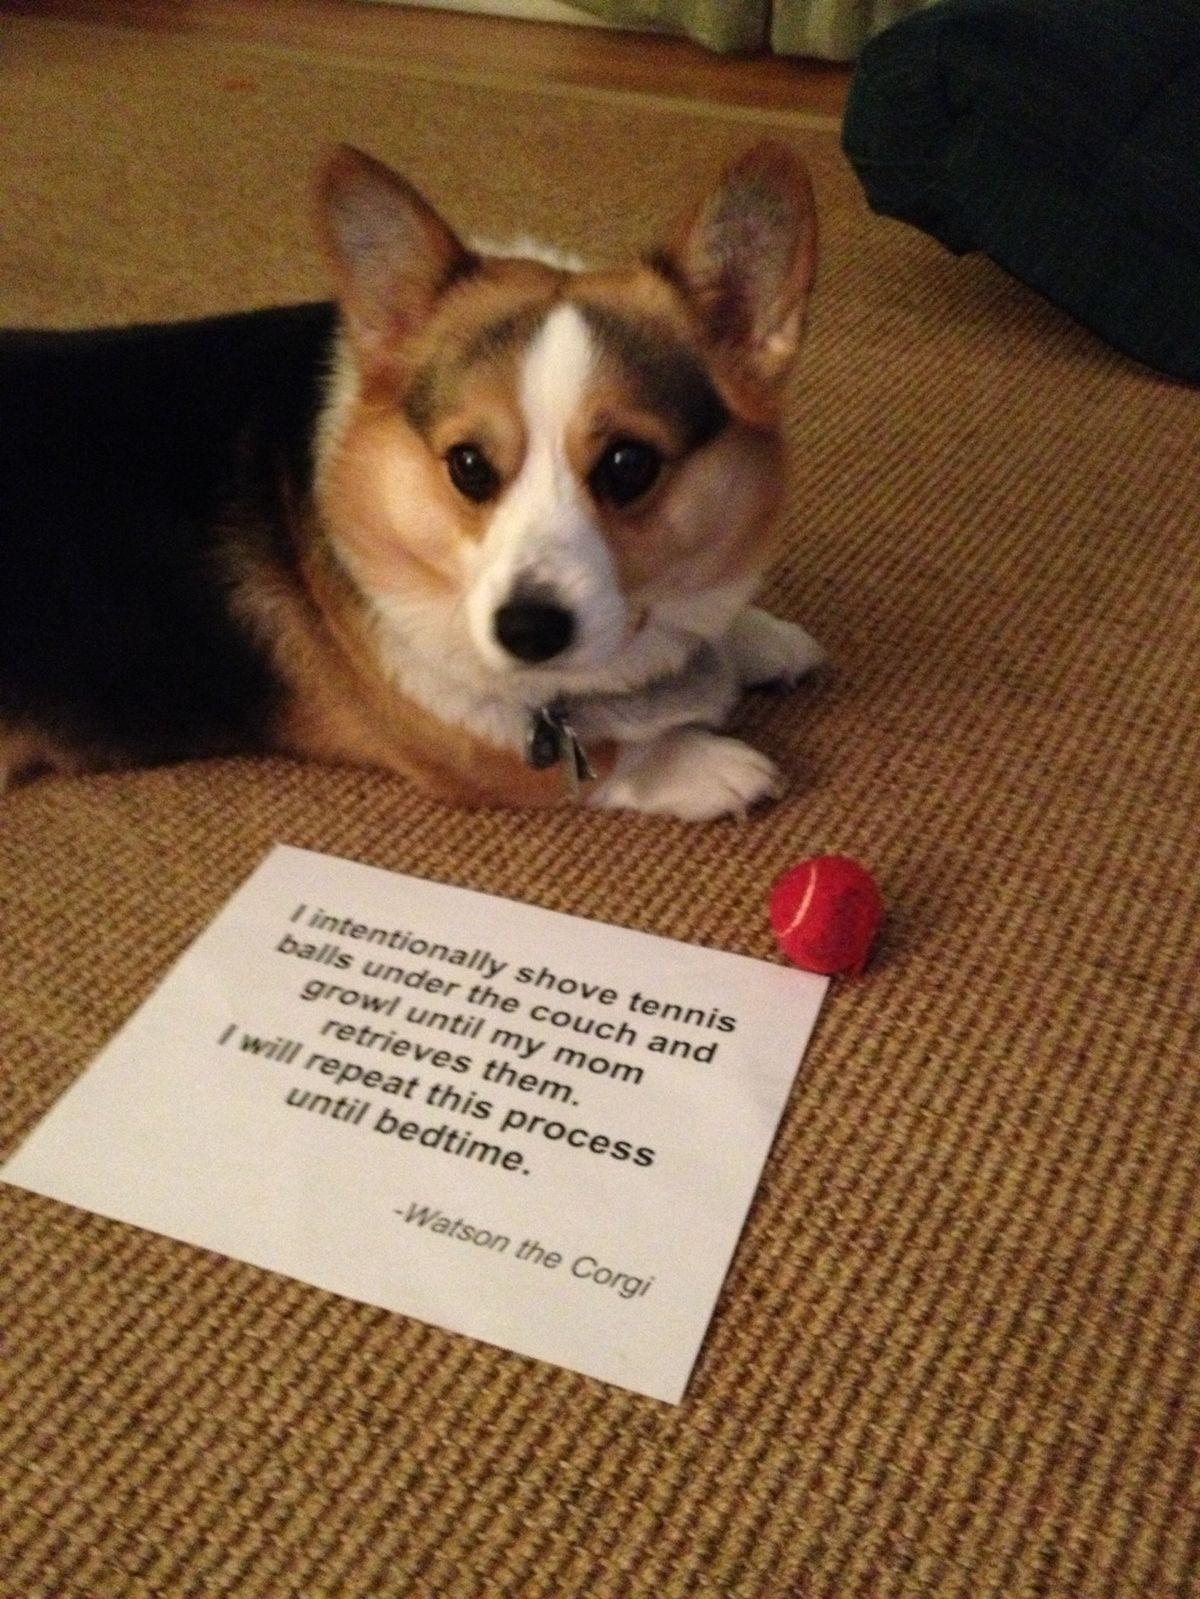 Pin by catherine whieldon on dogs pinterest corgi corgis and dog